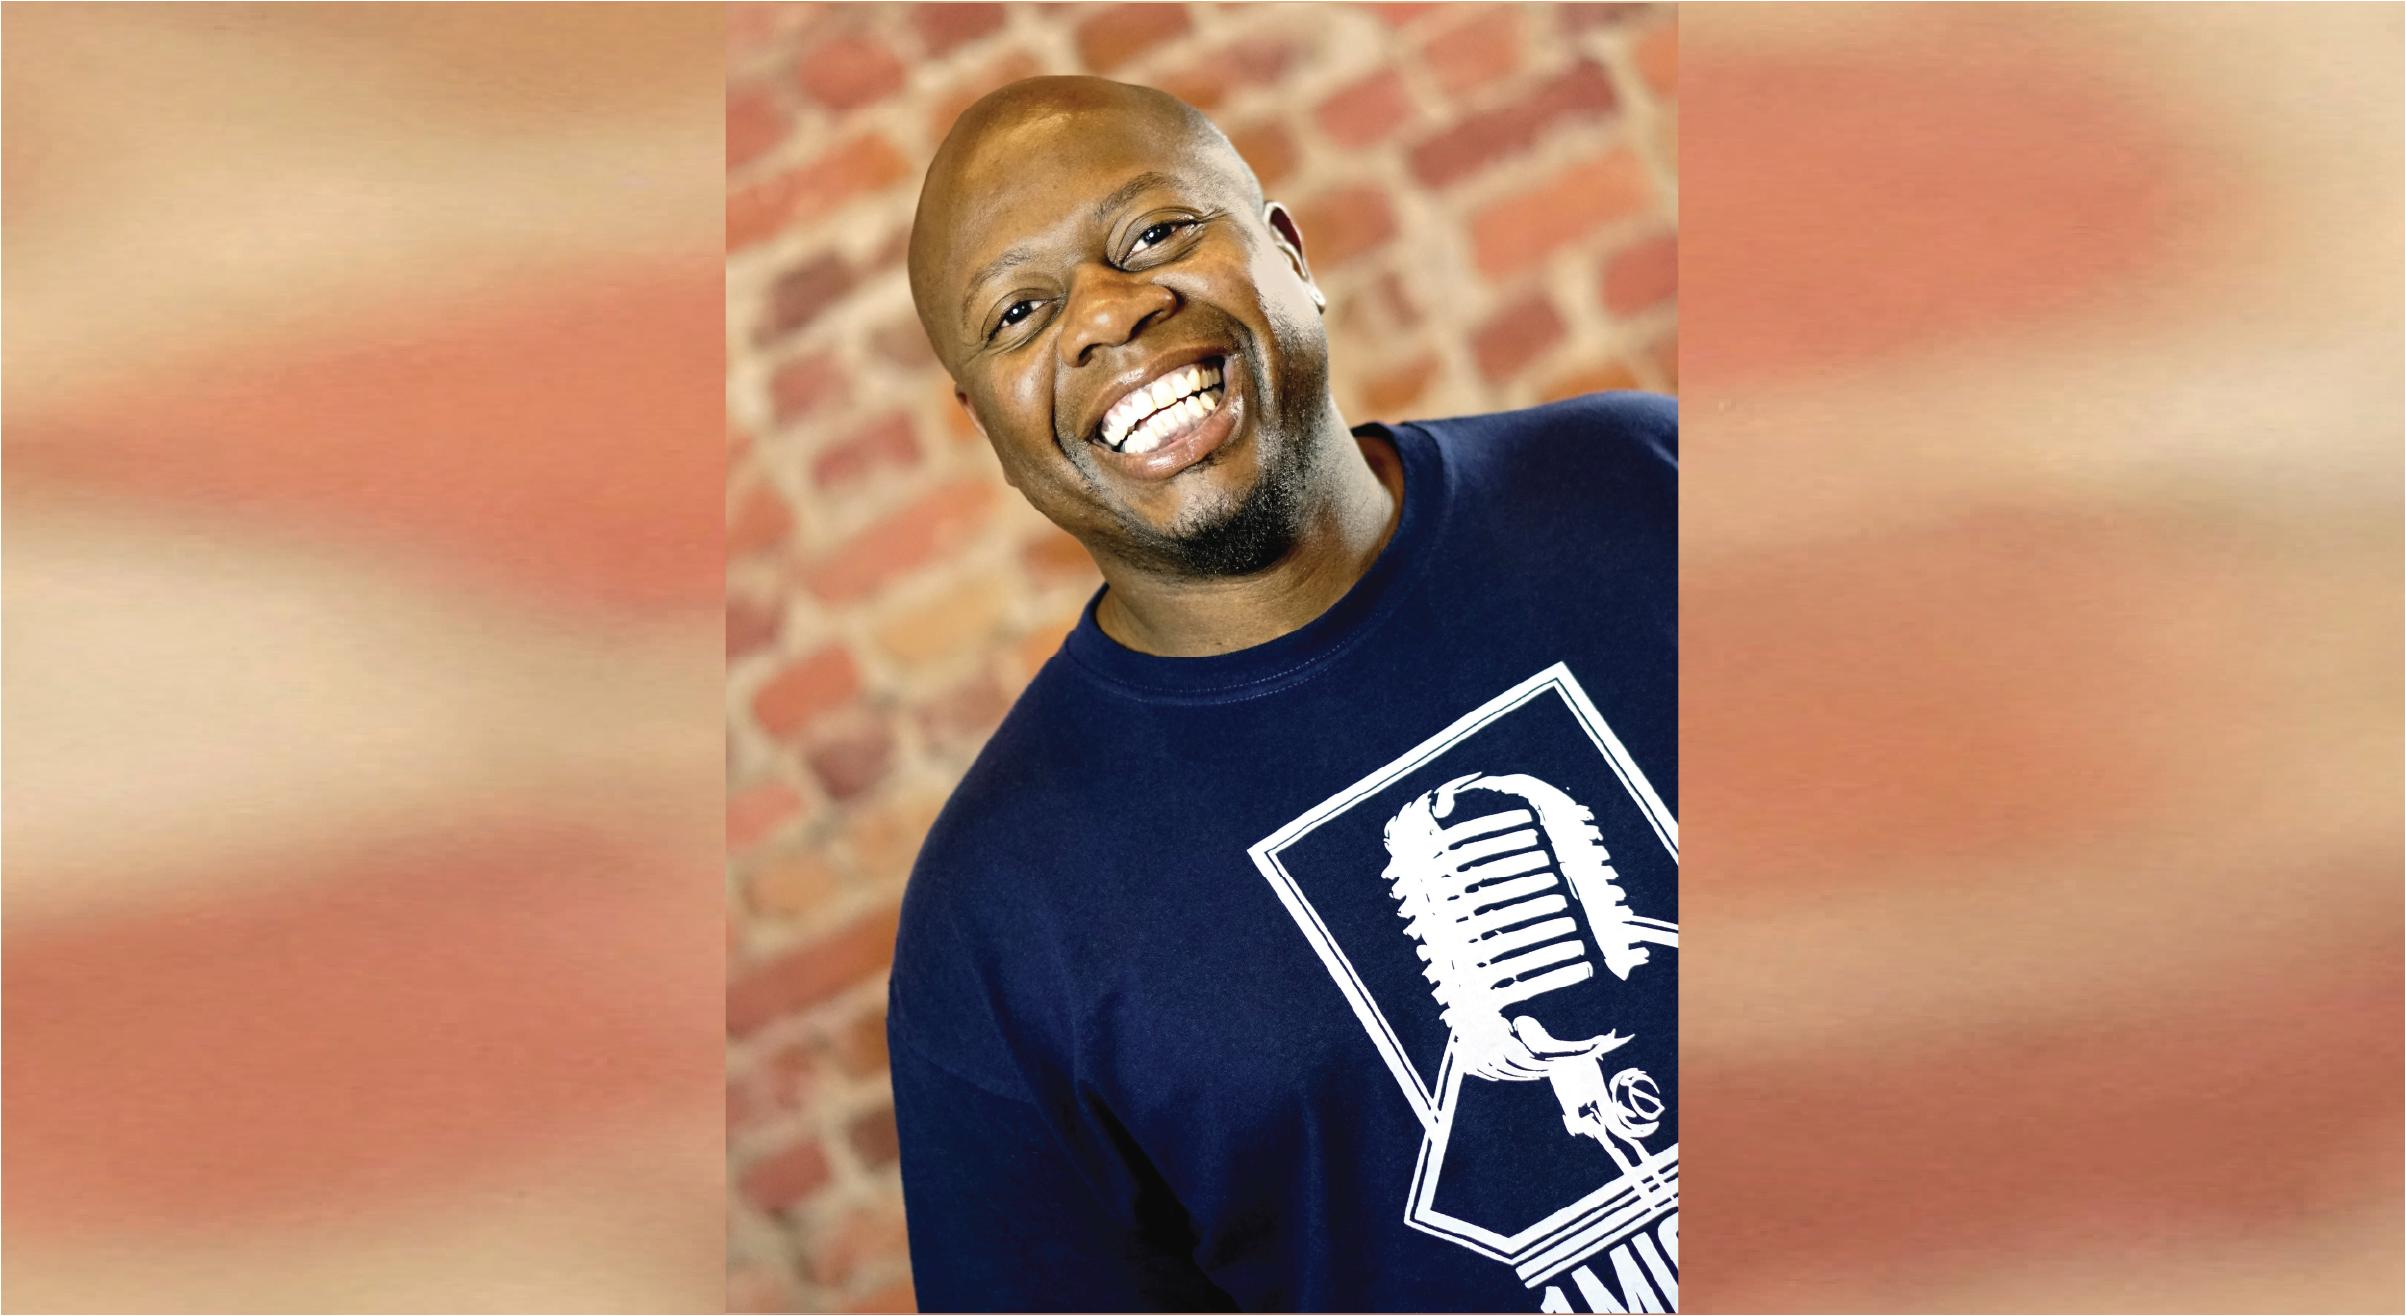 Comedian Adrian Washington